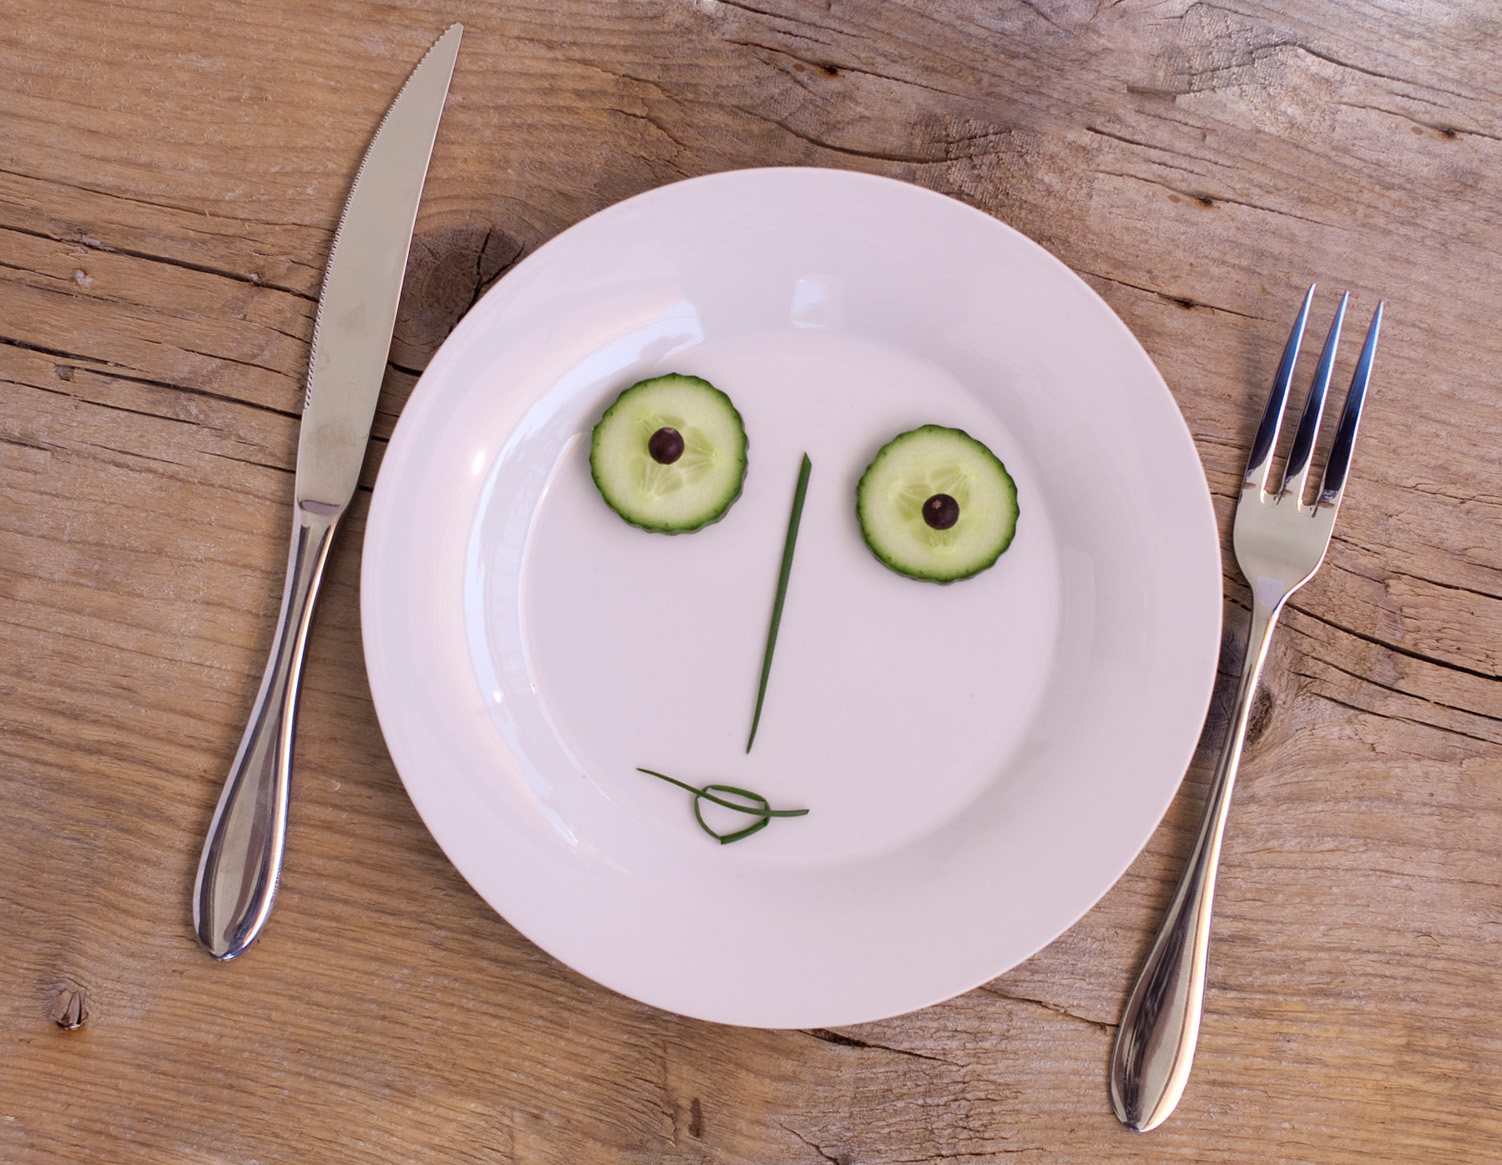 пост и лечебное голодание